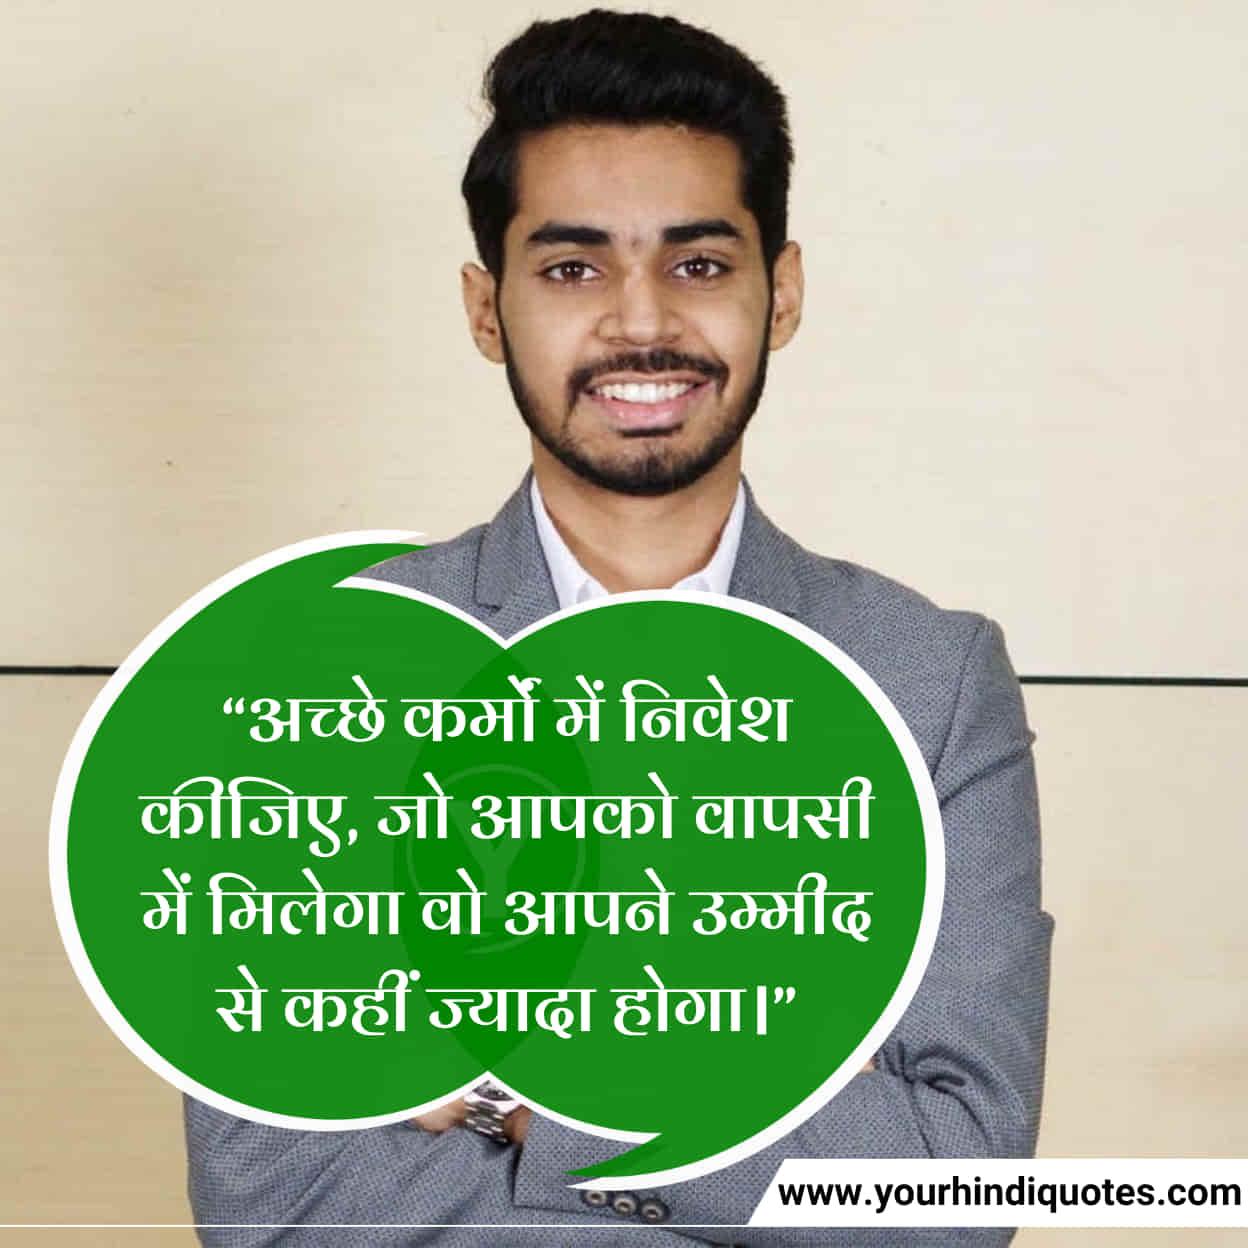 Hindi Karma Quotes On Life